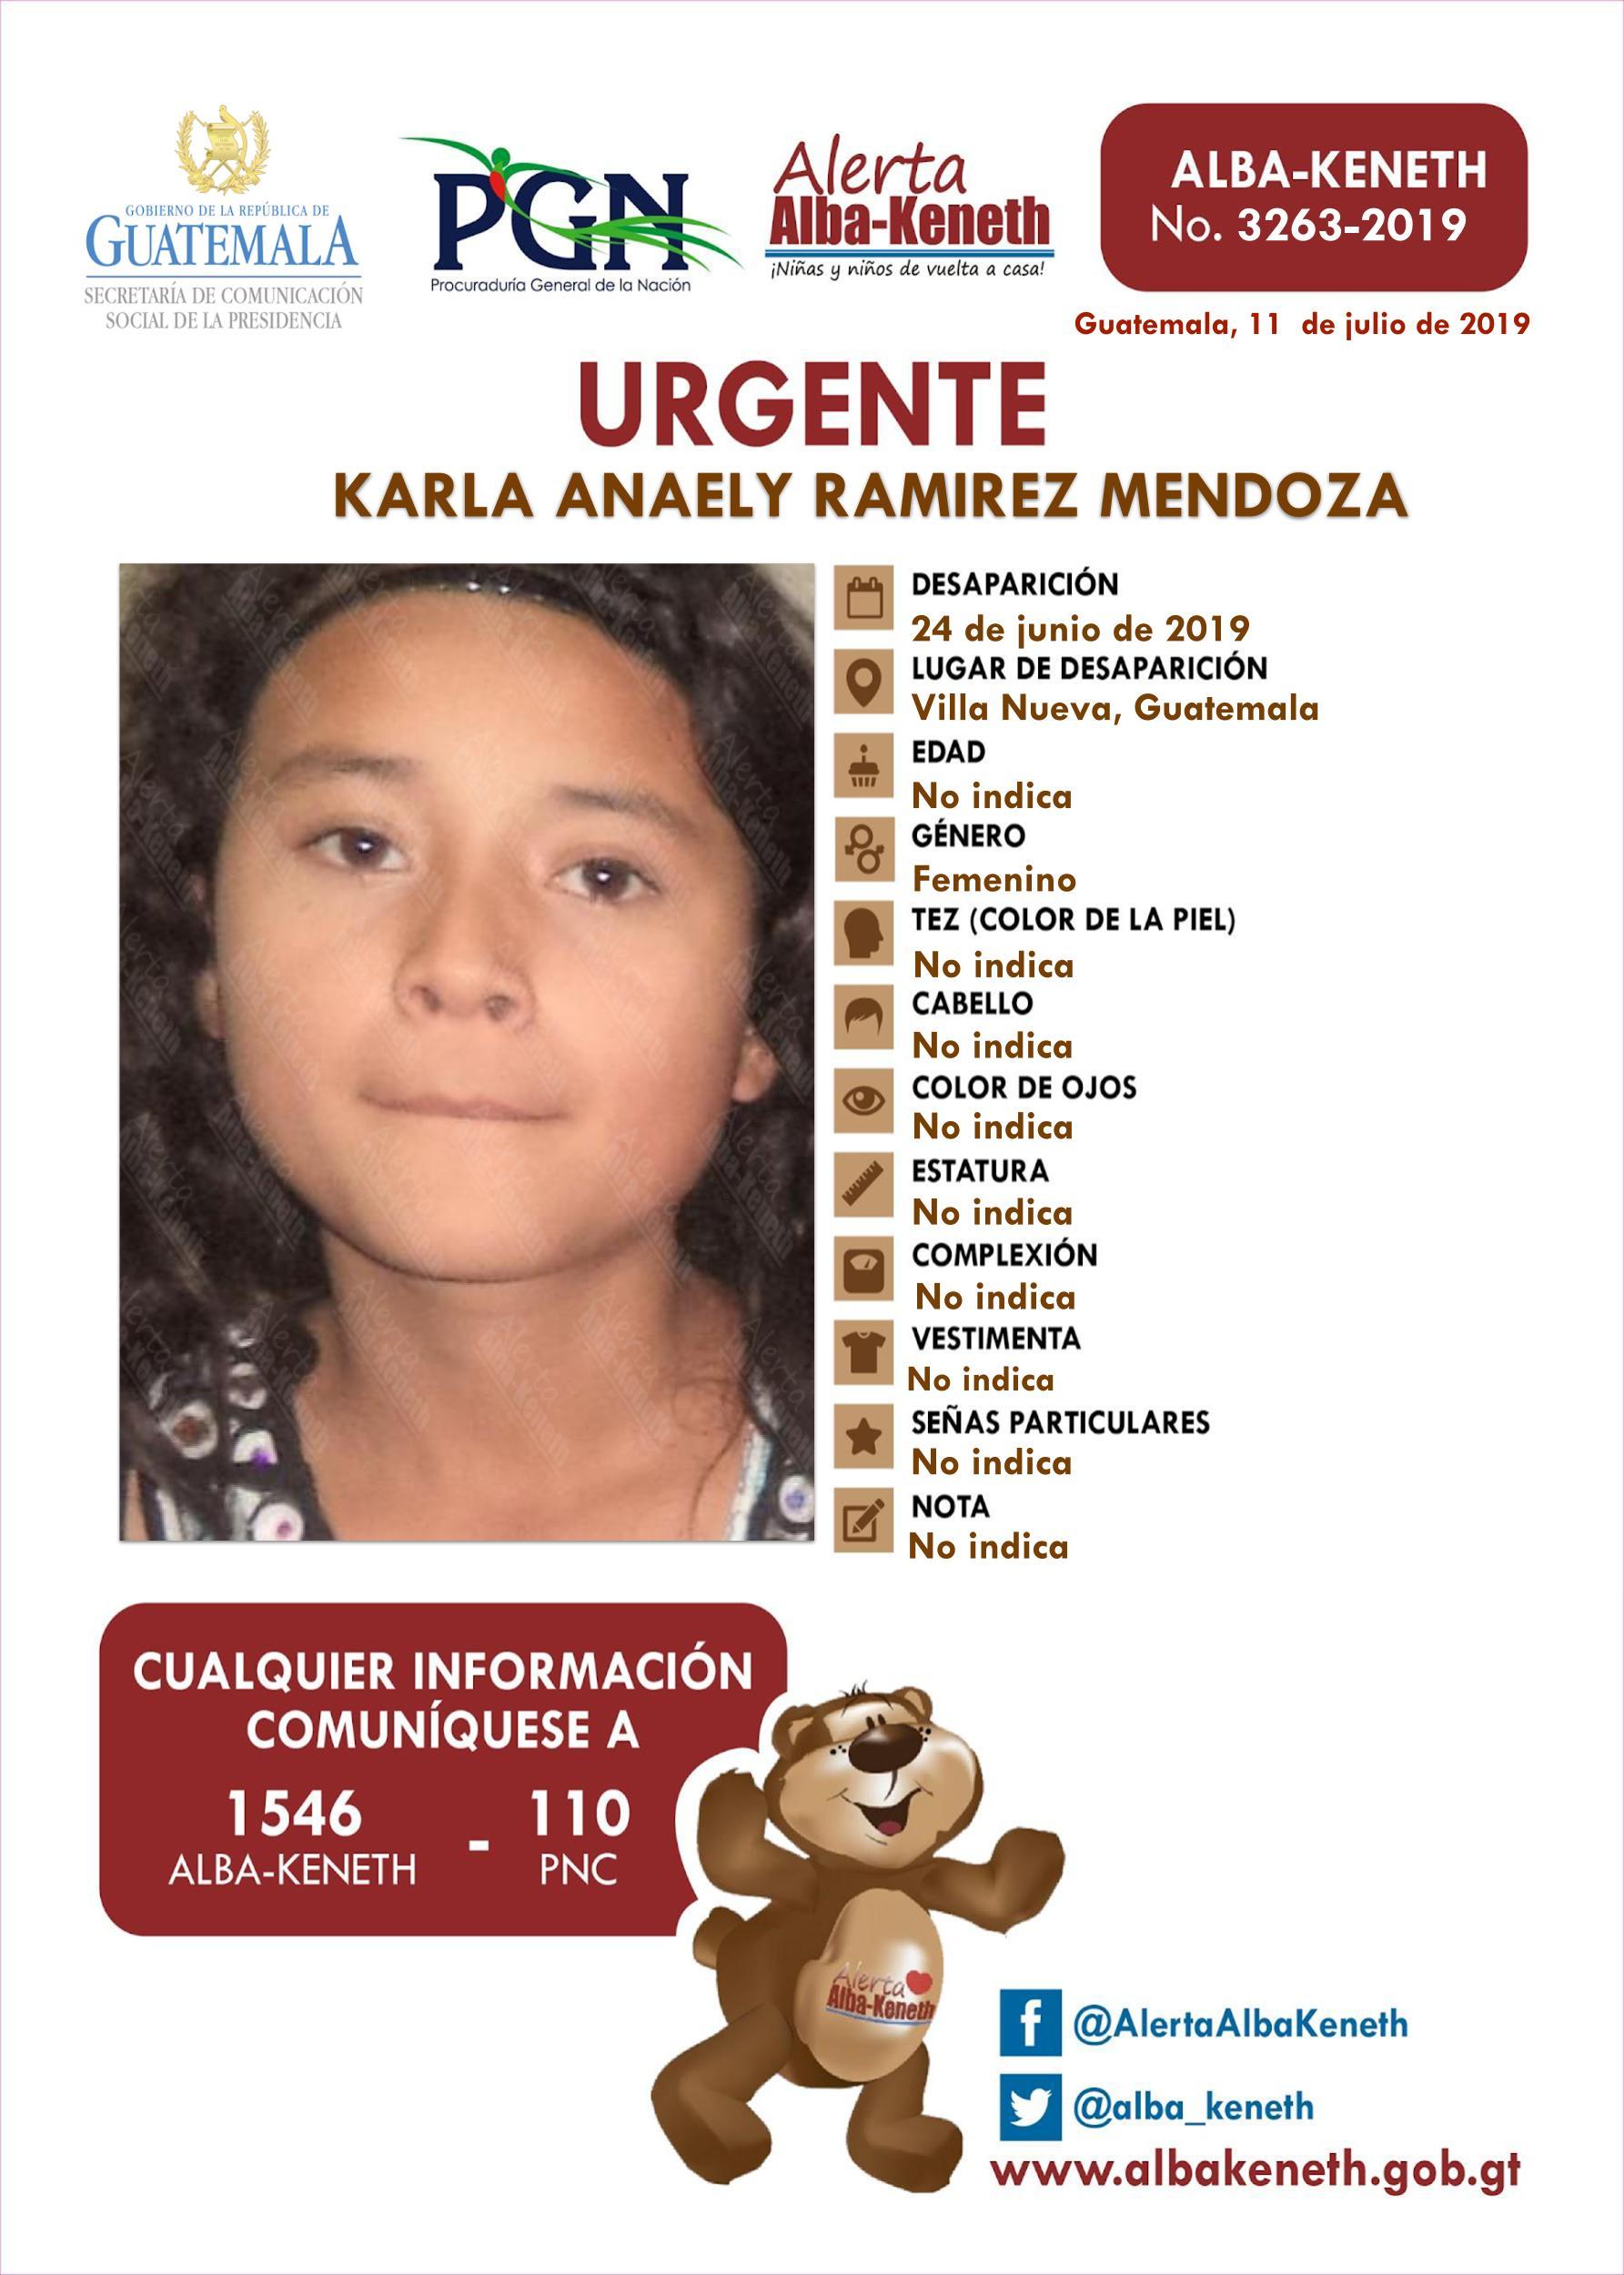 Karla Anaely Ramirez Mendoza